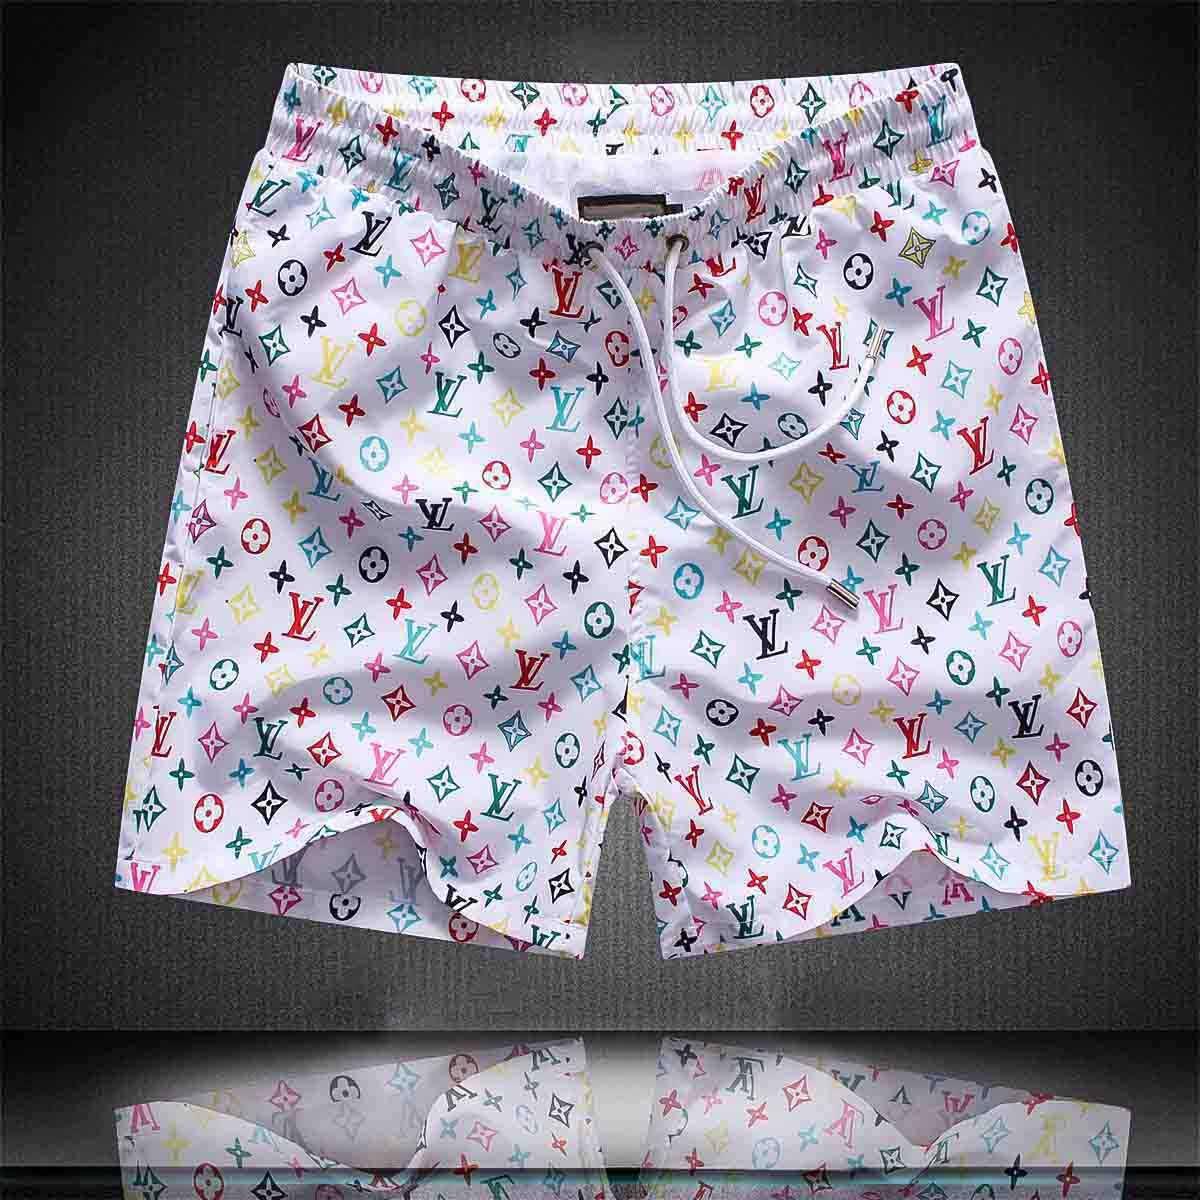 Lettre Designer avancée Imprimer Short Board Shorts Medusa Summer Beach Surf Shorts Pantalons Natation Hommes